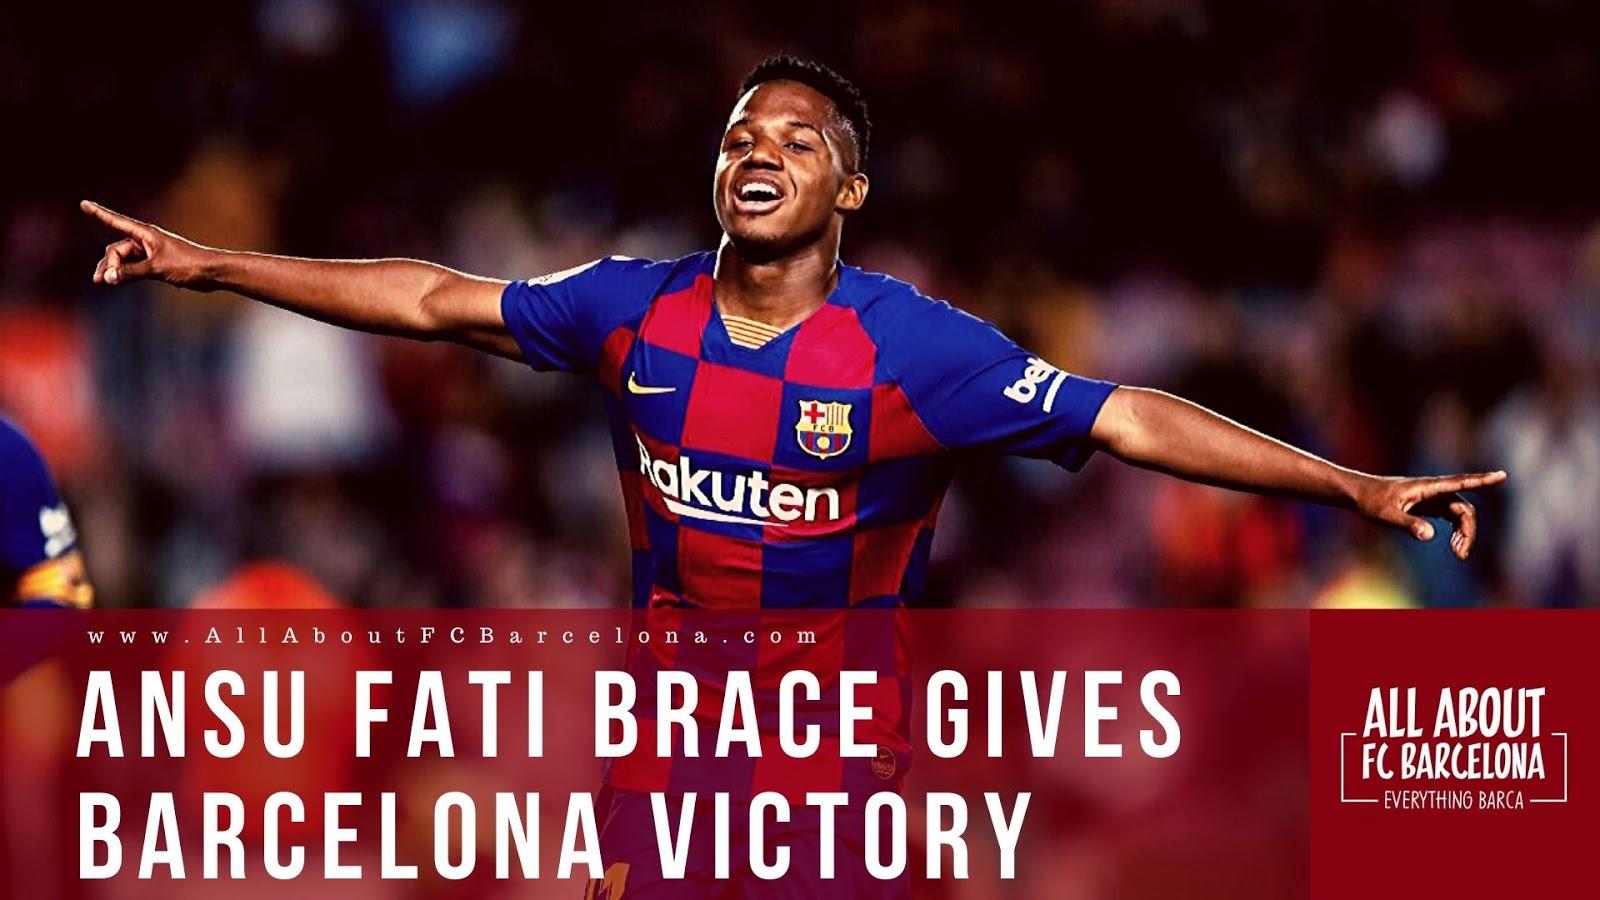 Ansu Fati Brace Secures Barcelona an Essential Victory that inspires Hope #AnsuFati #FCBarcelona